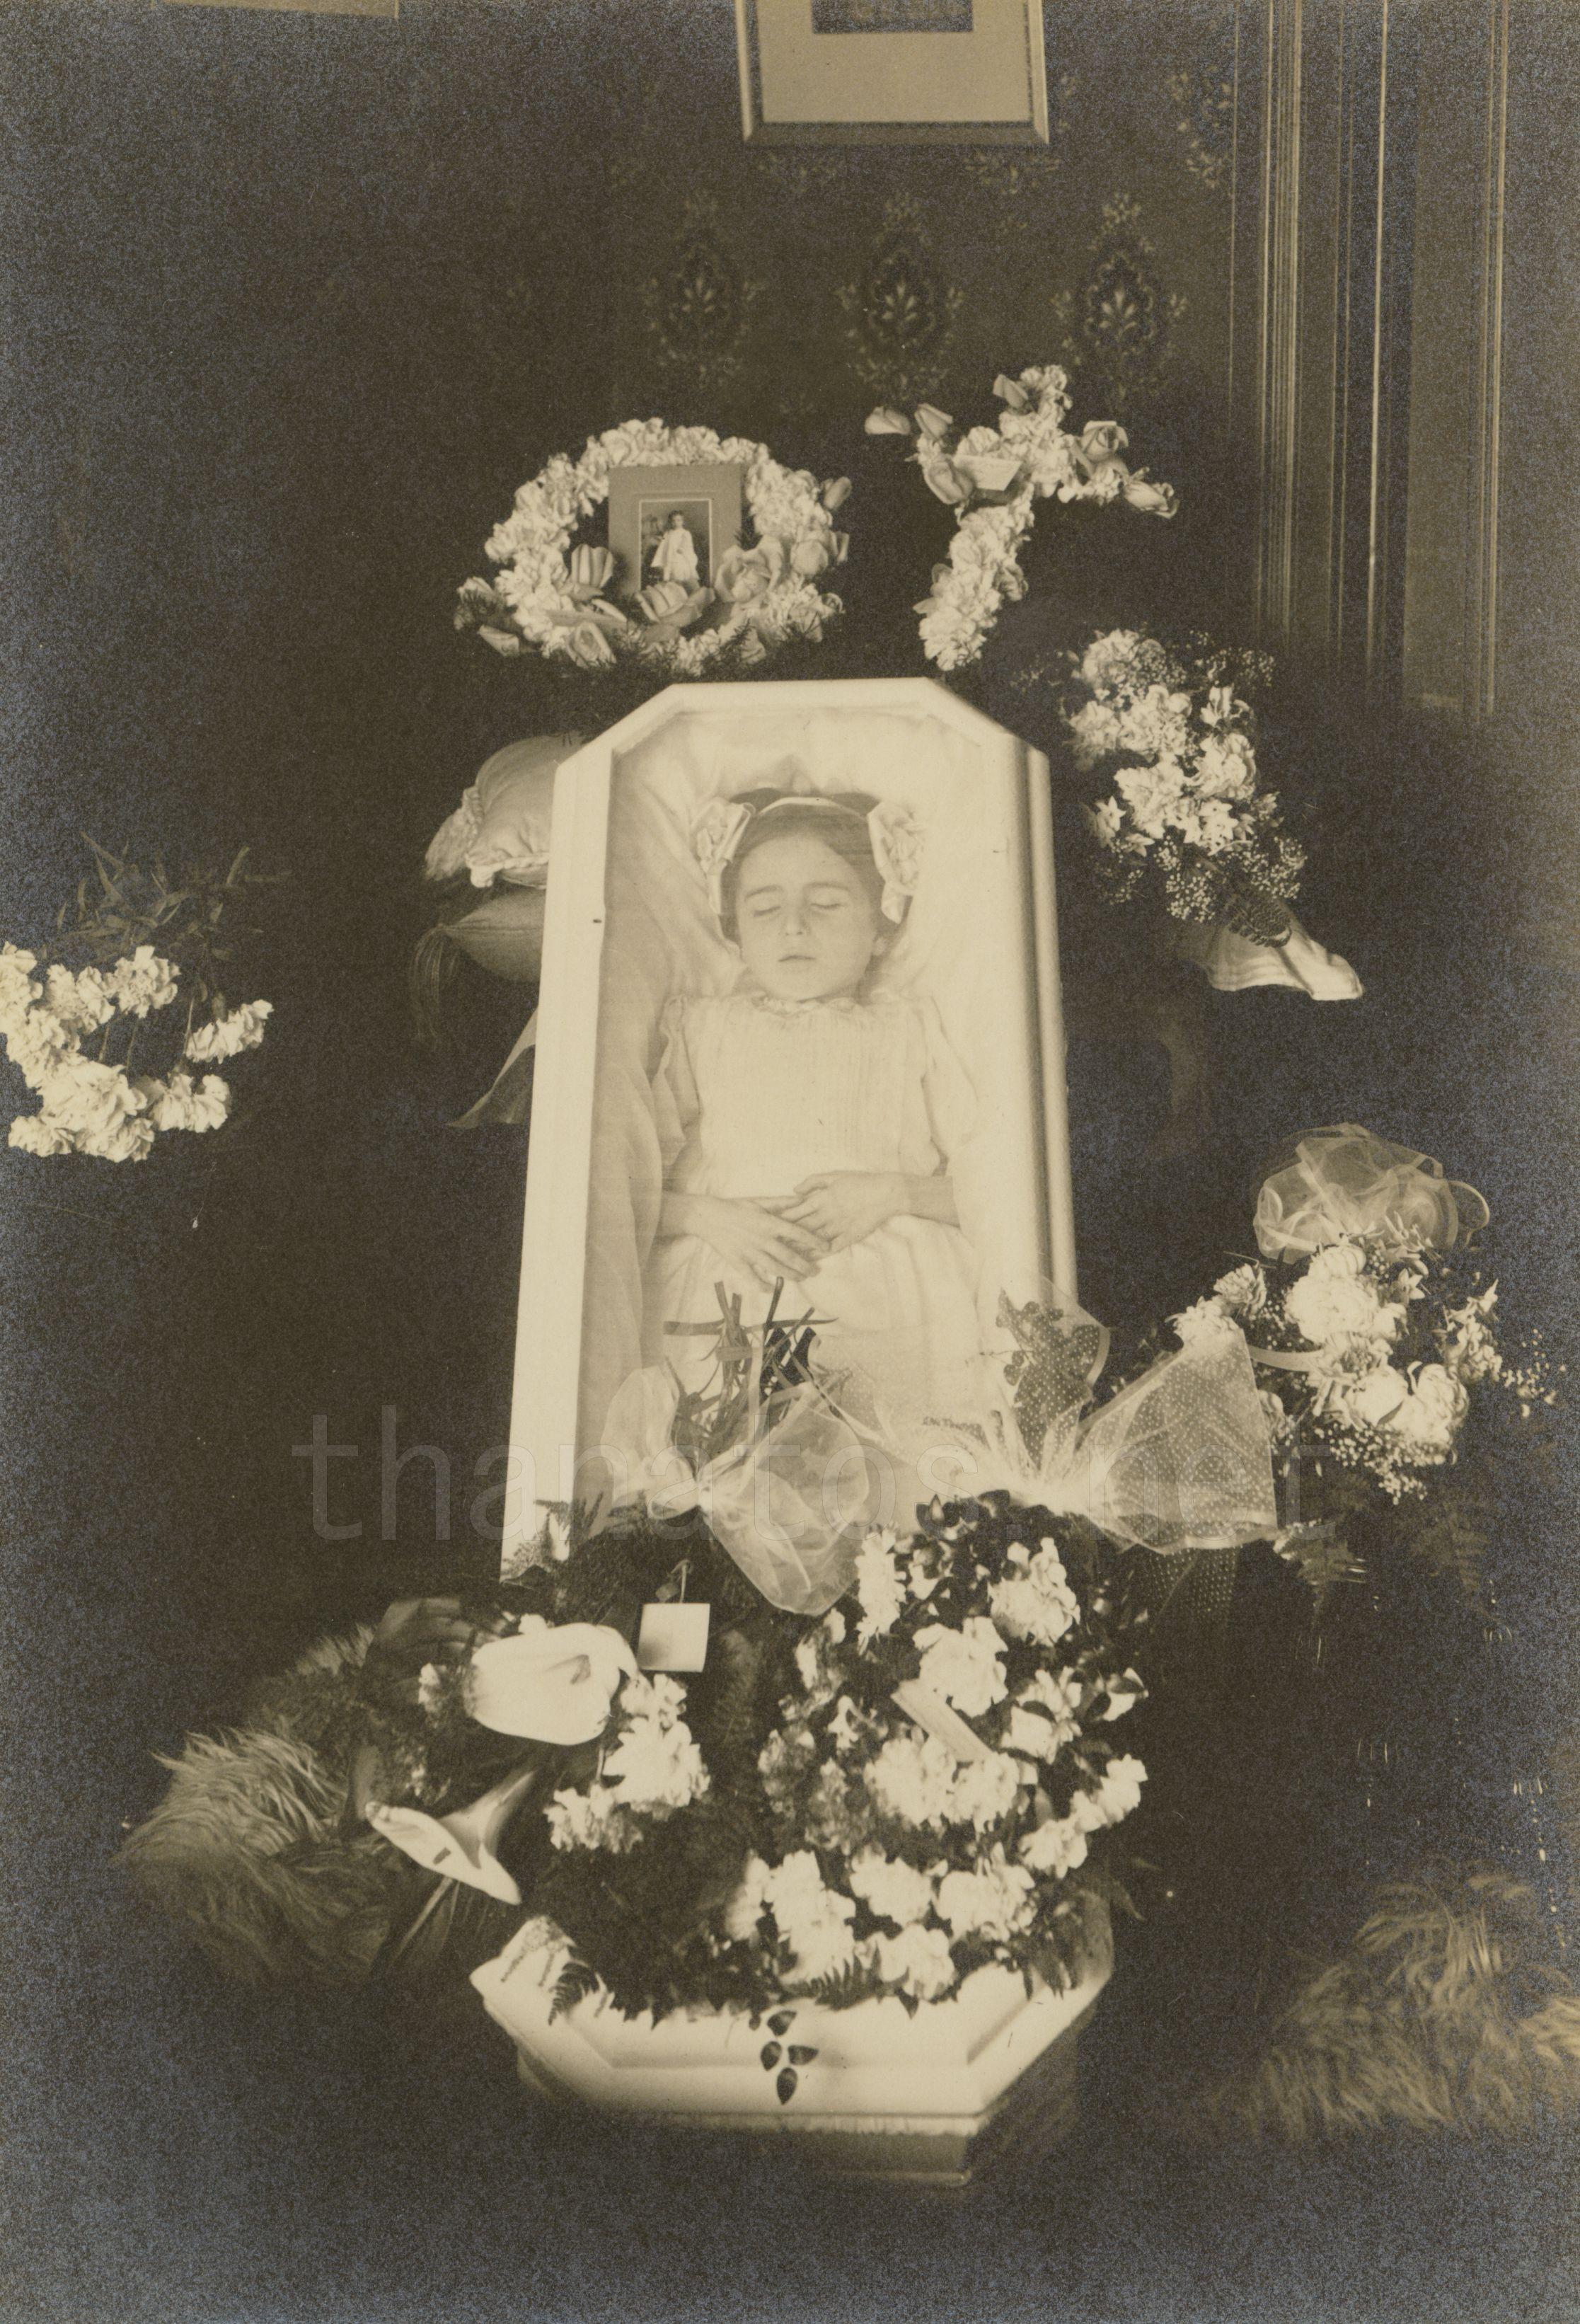 Young girl in casket